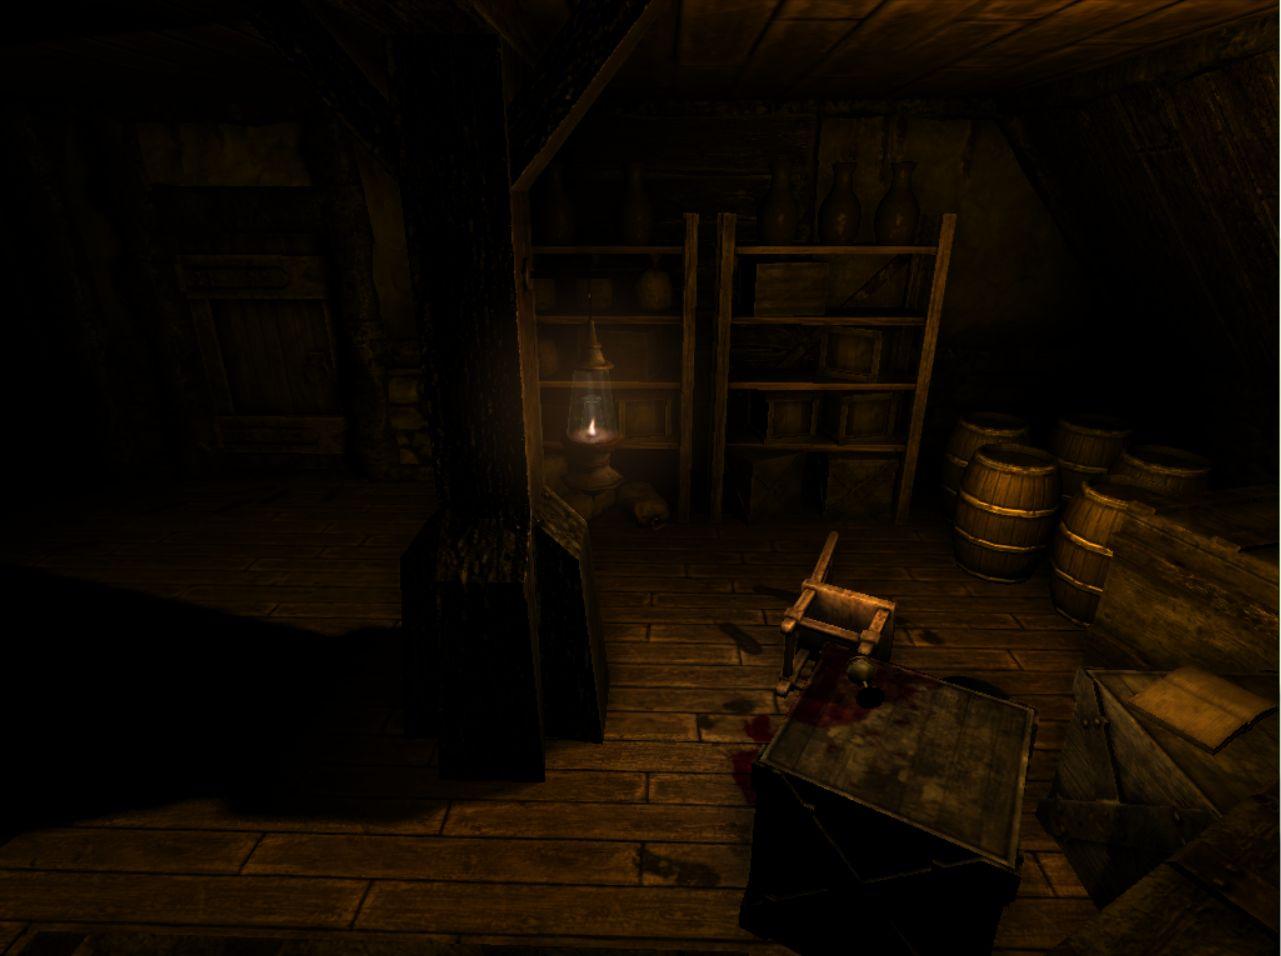 [Image: ruinedhouse4.jpg]